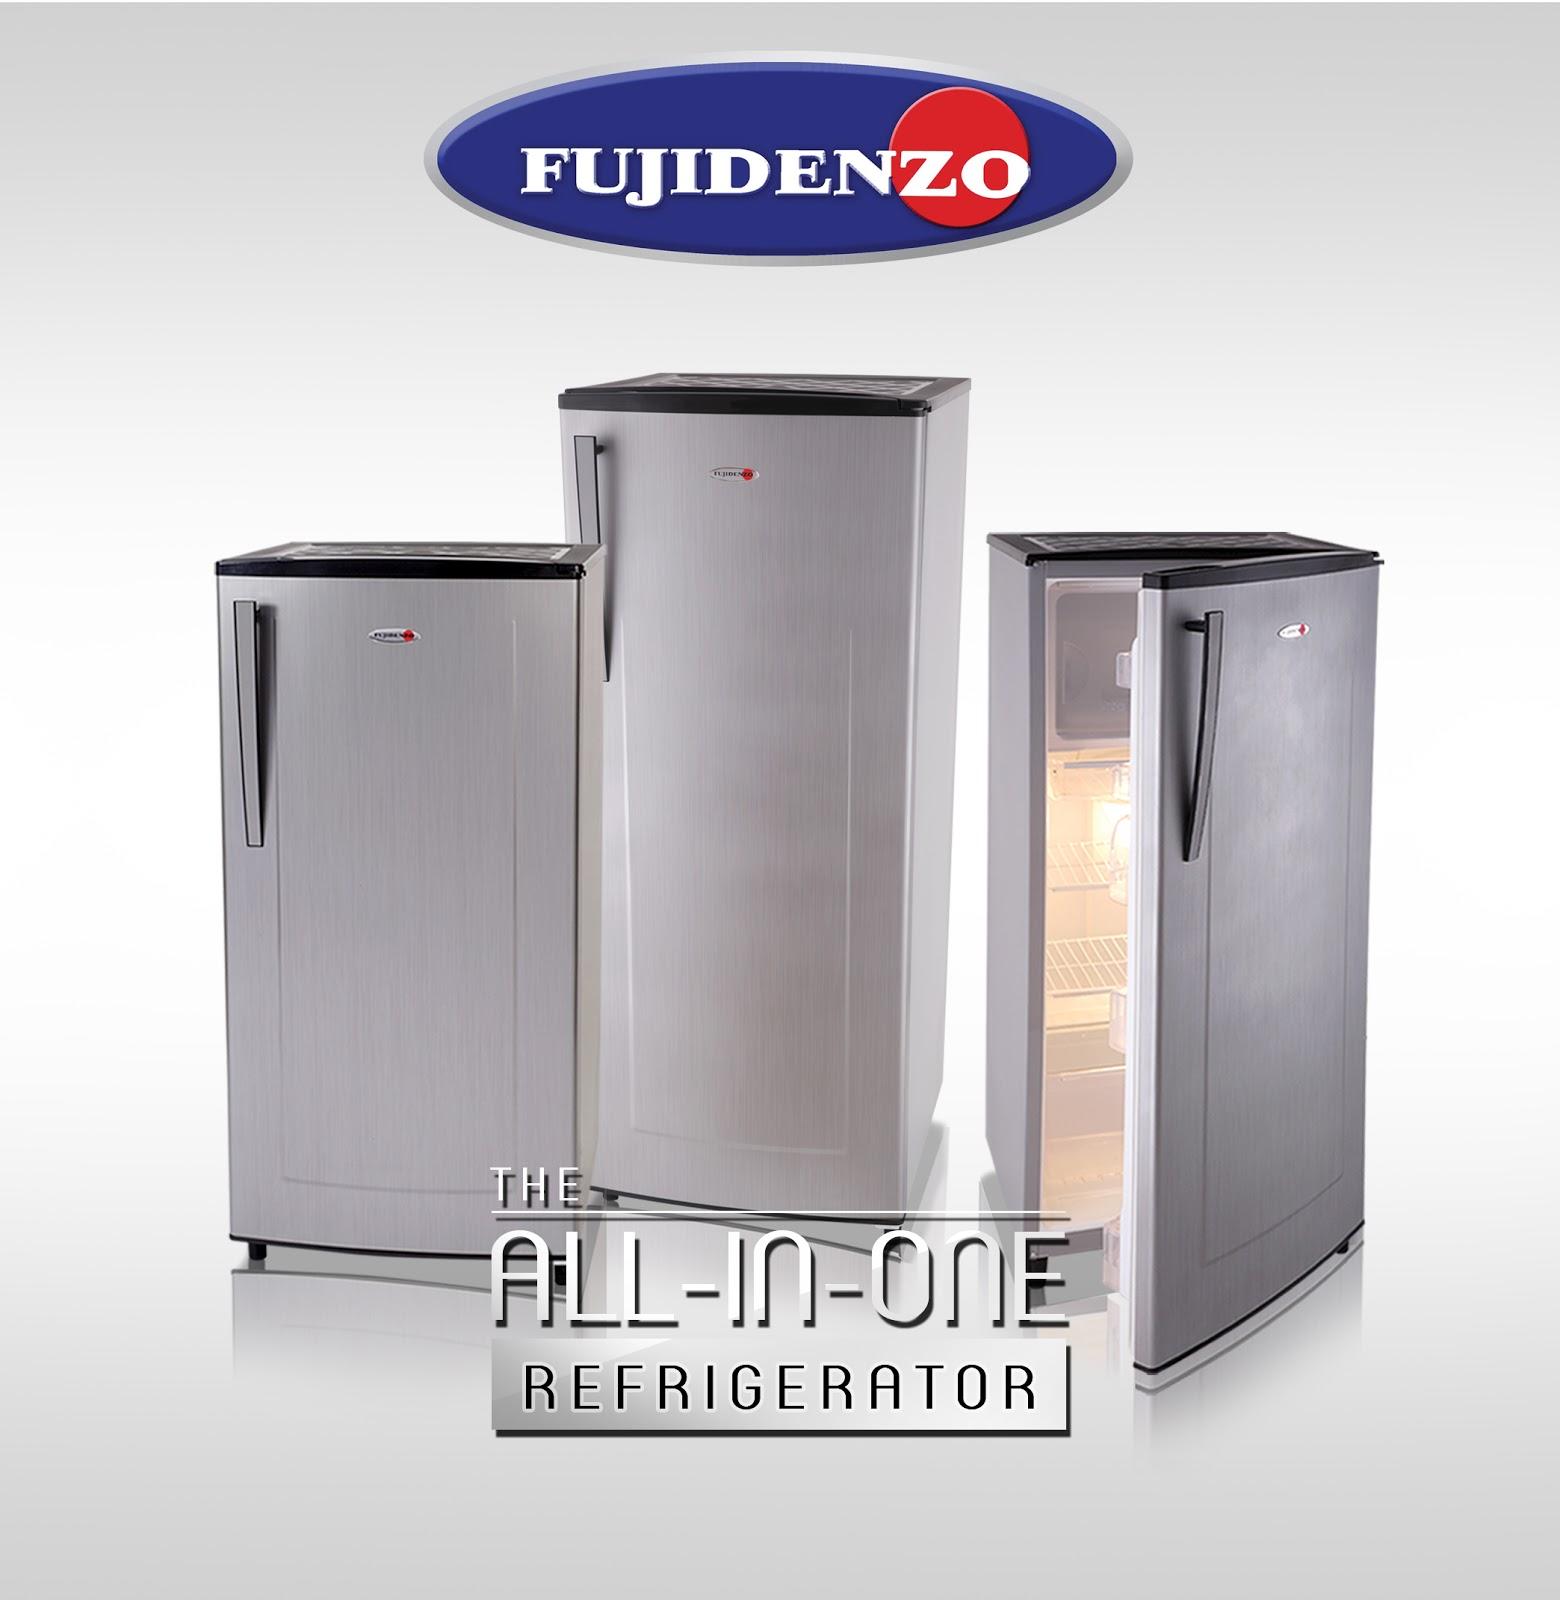 Introducing Fujidenzou0027s All In One Refrigerators | Enjoying Wonderful World